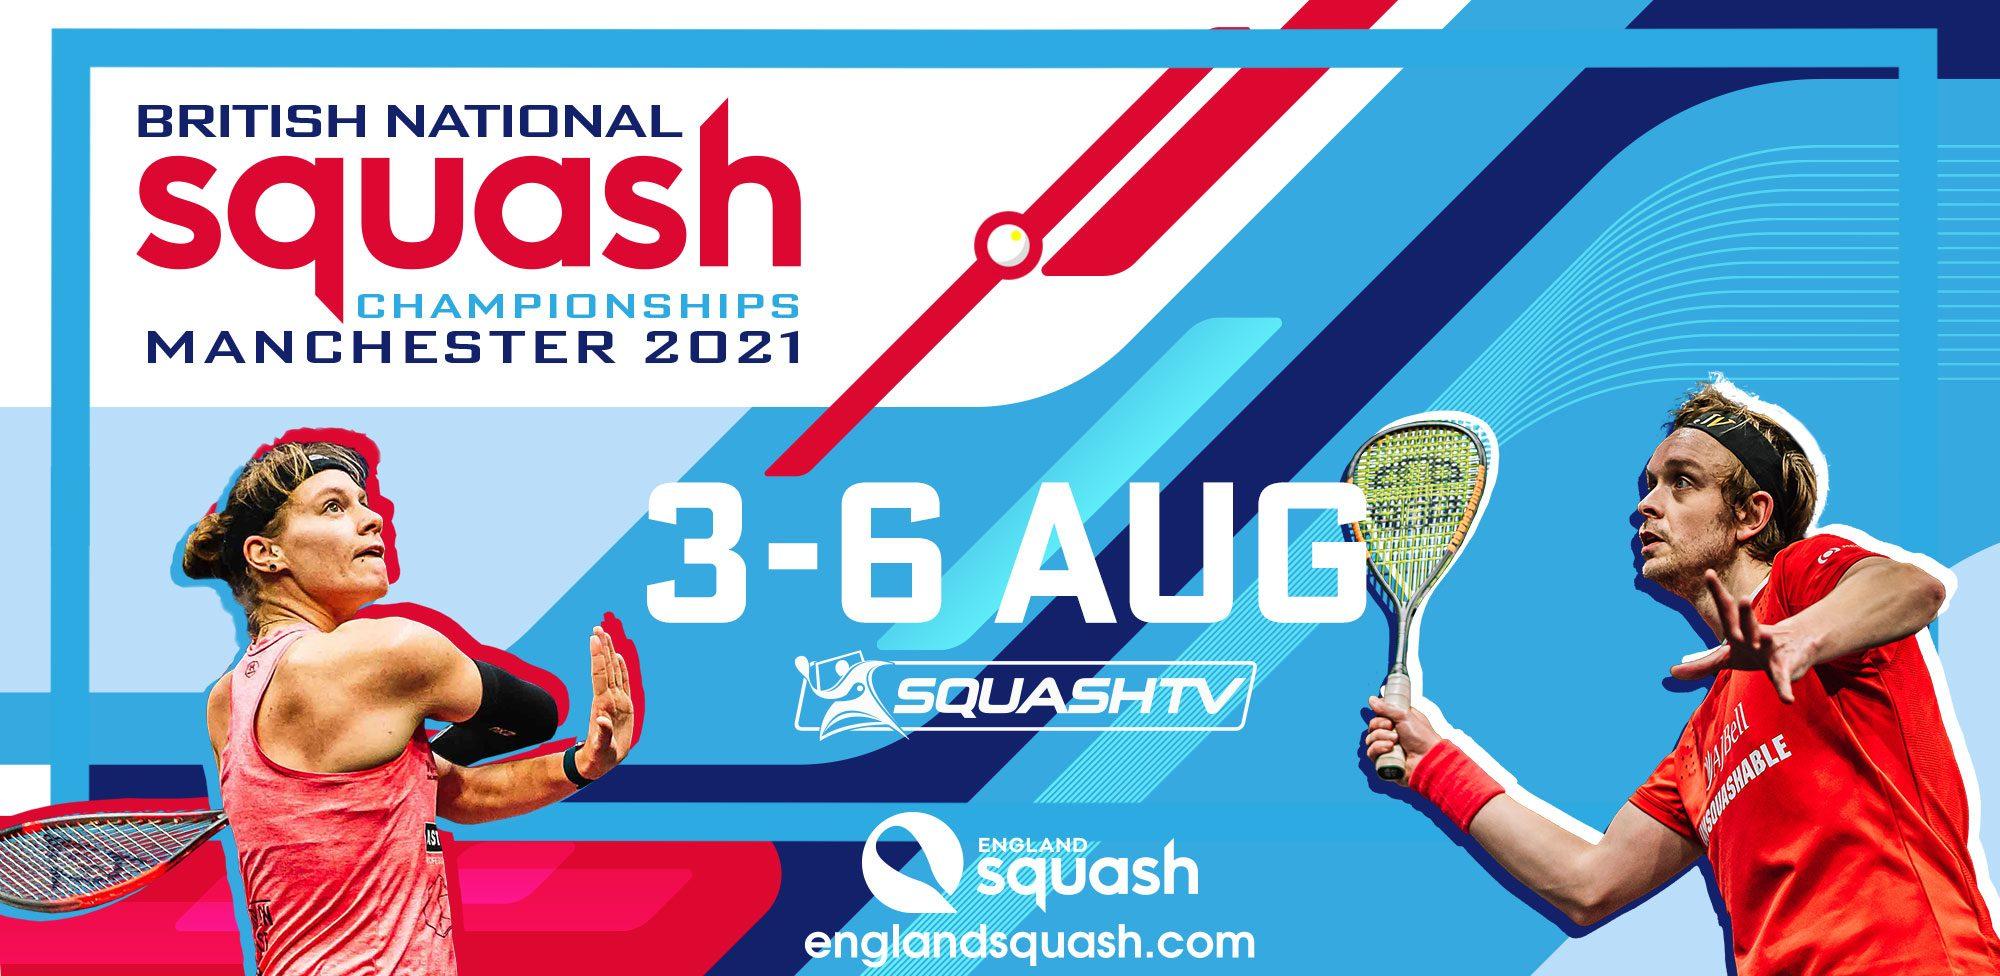 British National Squash Championships